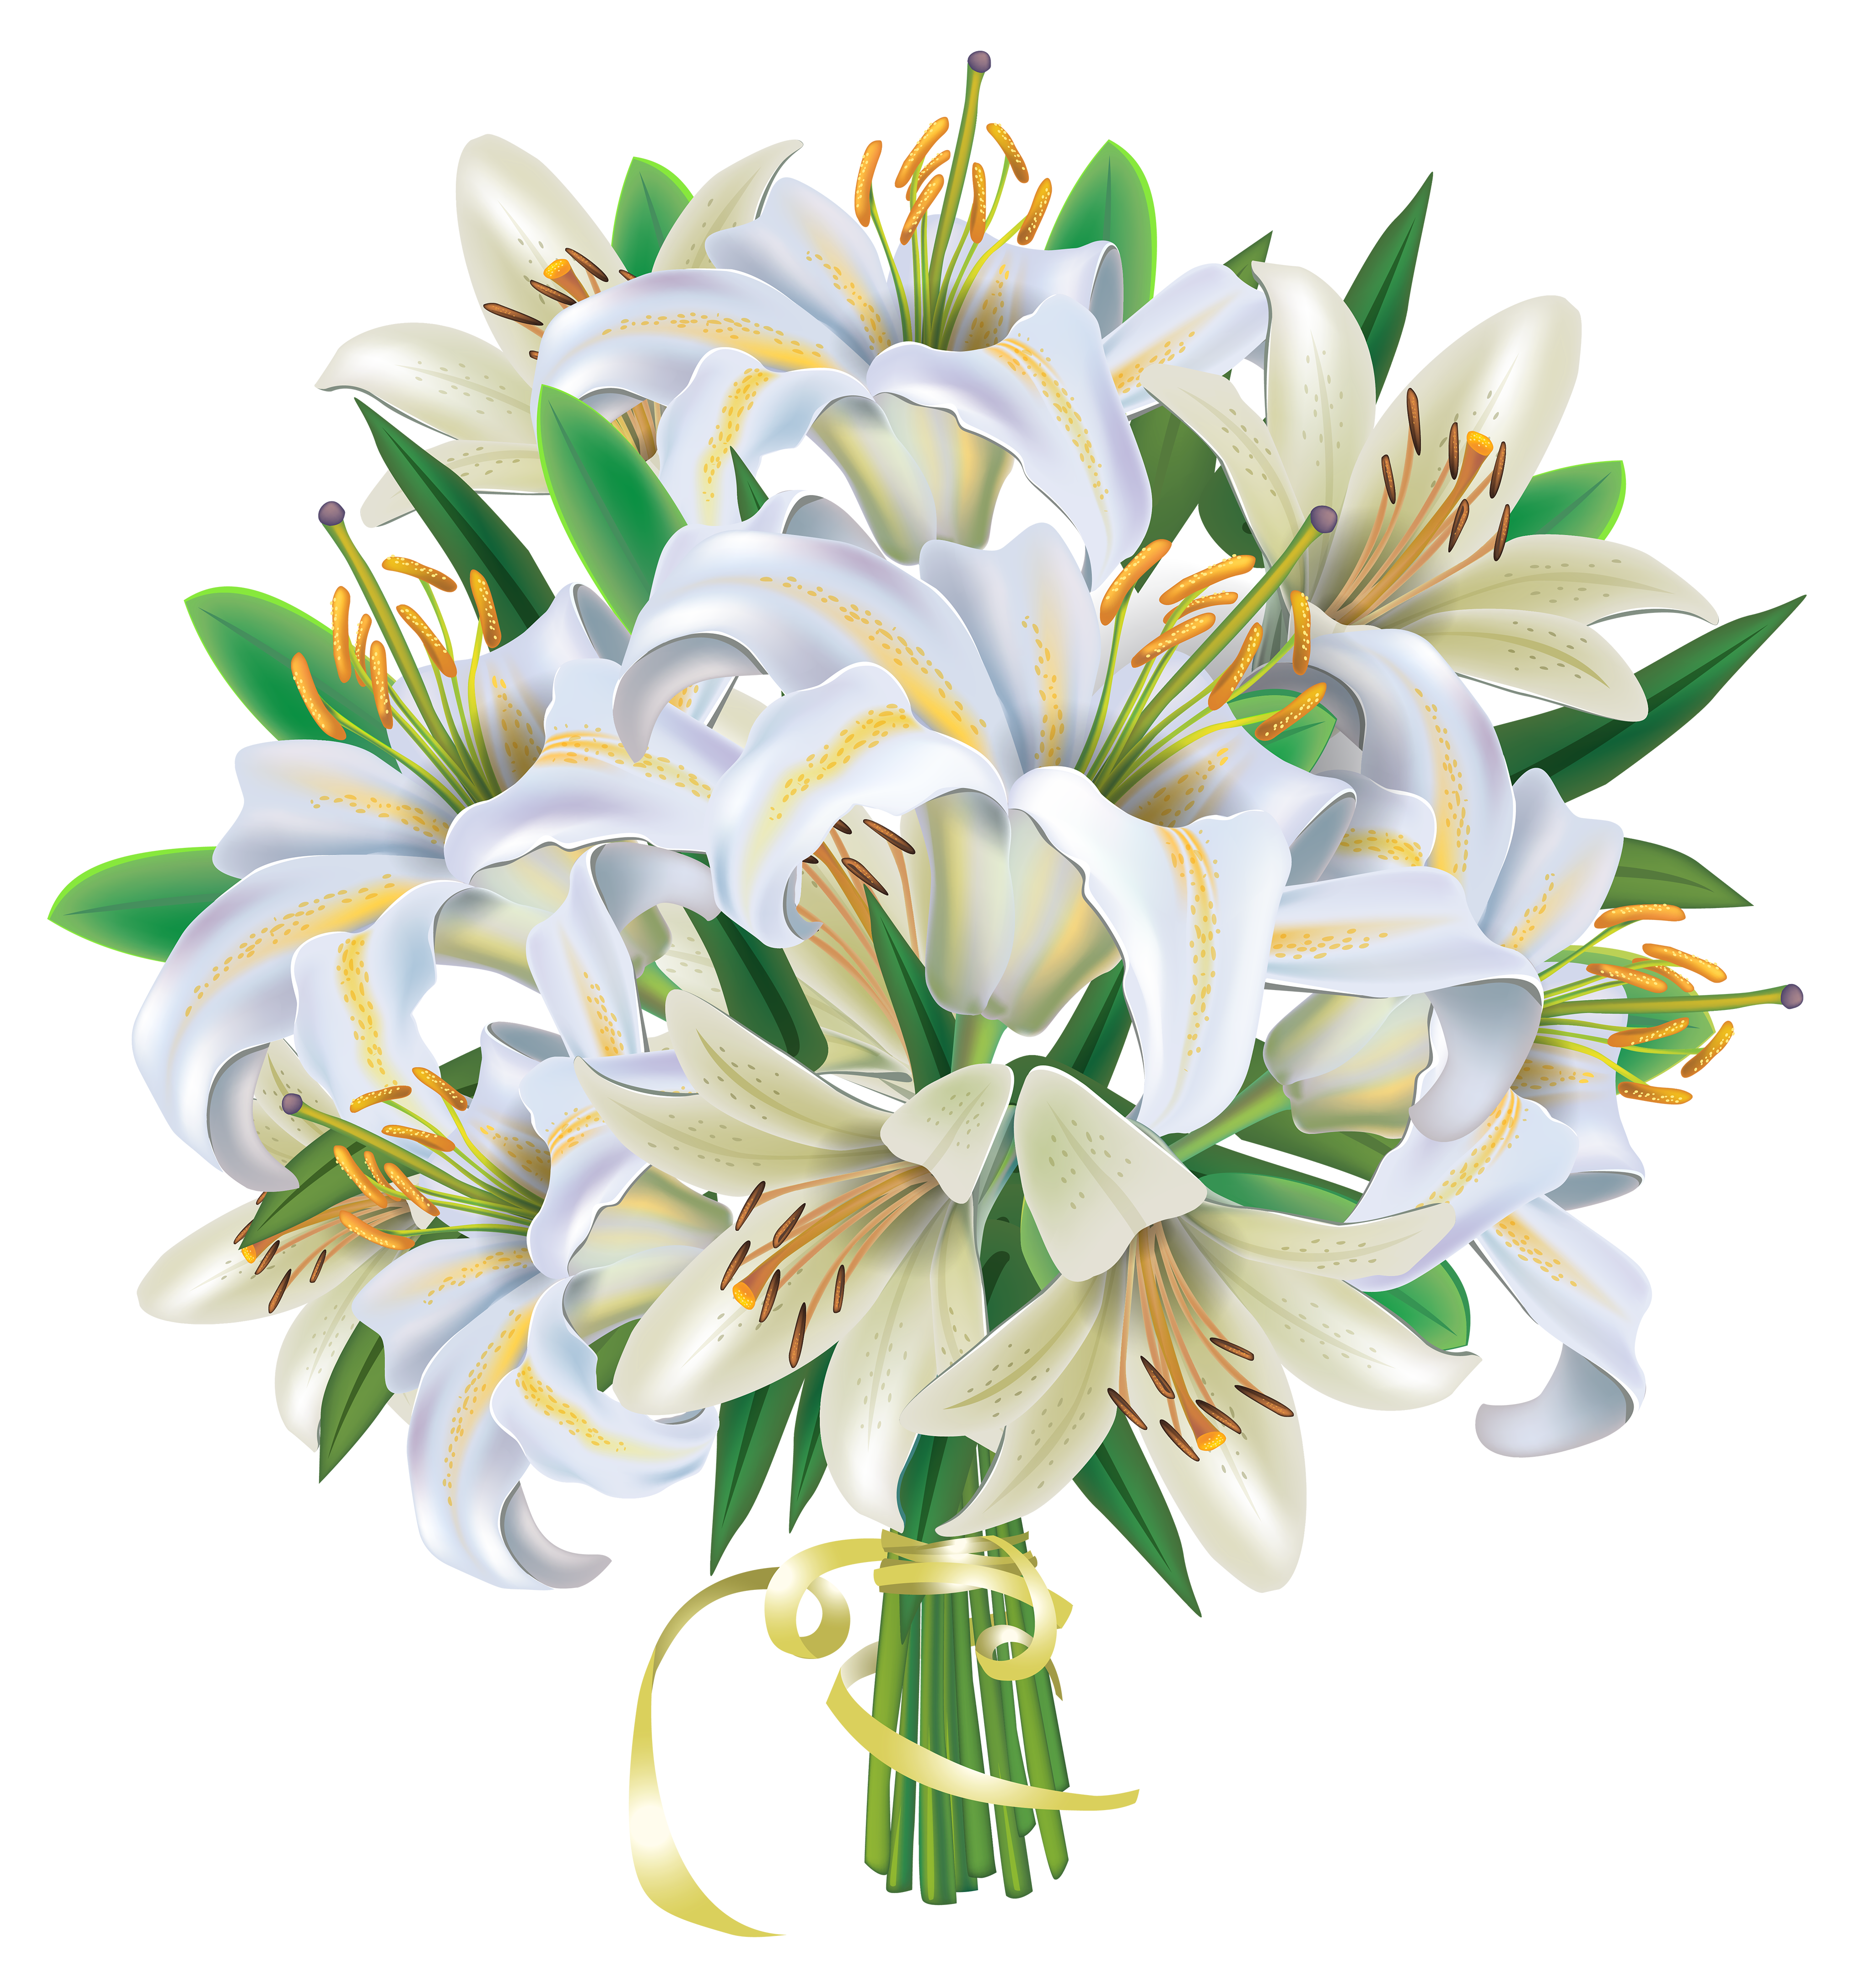 White Lilies Flowers Bouquet PNG Clipart Image.